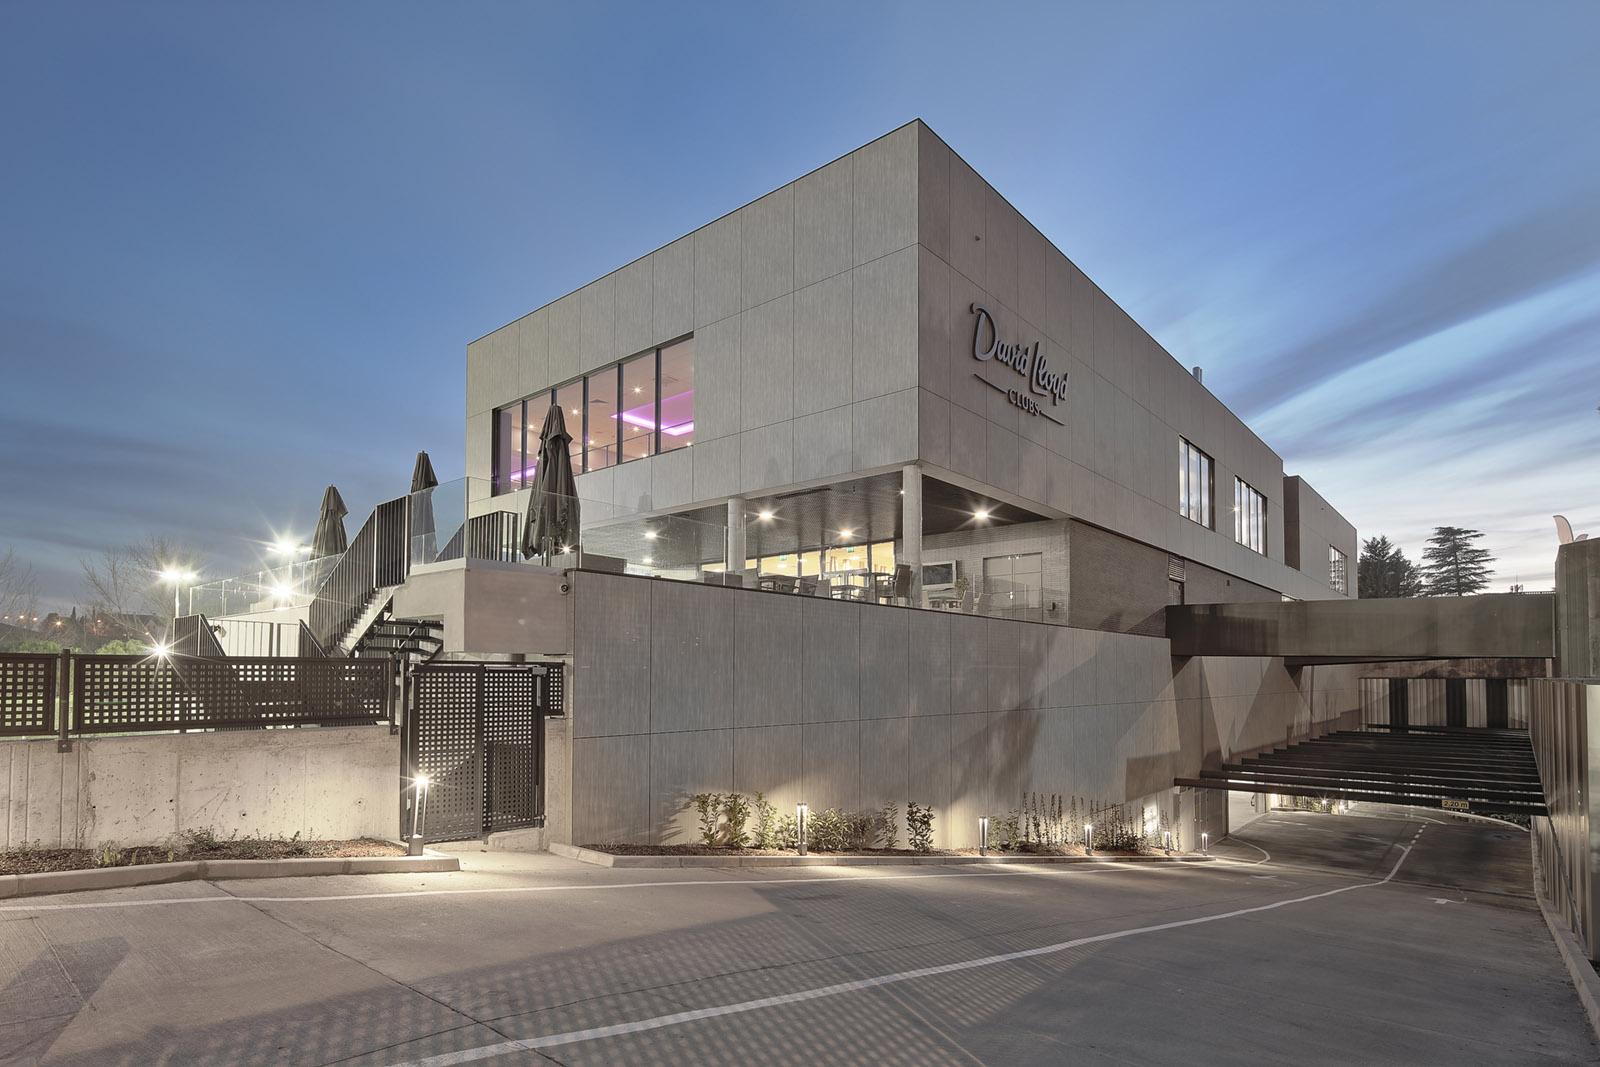 Architectural667-Interior-photographer-Madrid-Spain-.jpg